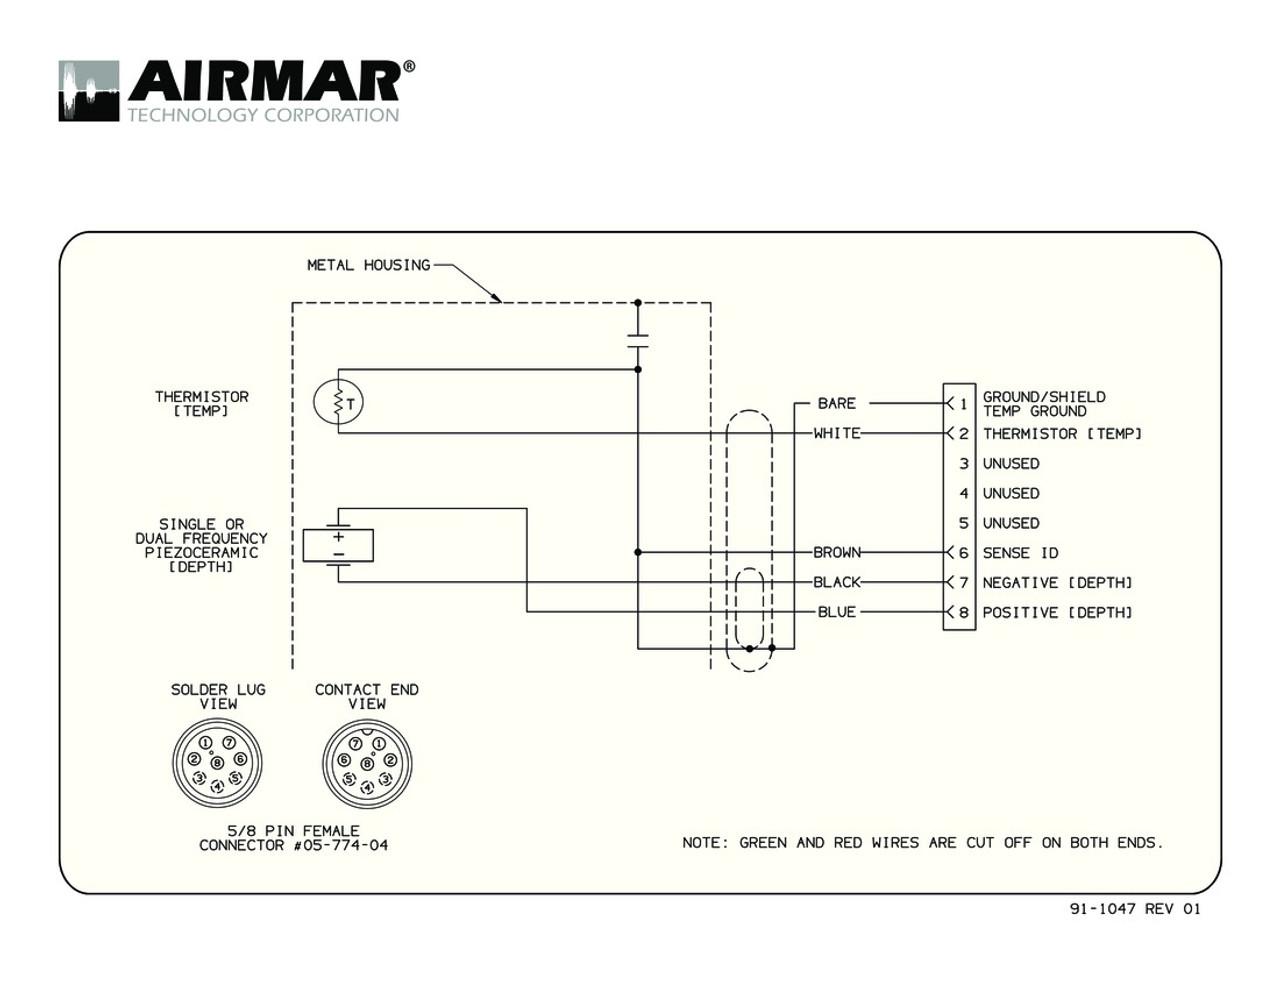 medium resolution of airmar wiring diagram garmin b117 8 pin d t blue bottle marine wiring diagram for garmin fishfinder 90 wiring diagram garmin